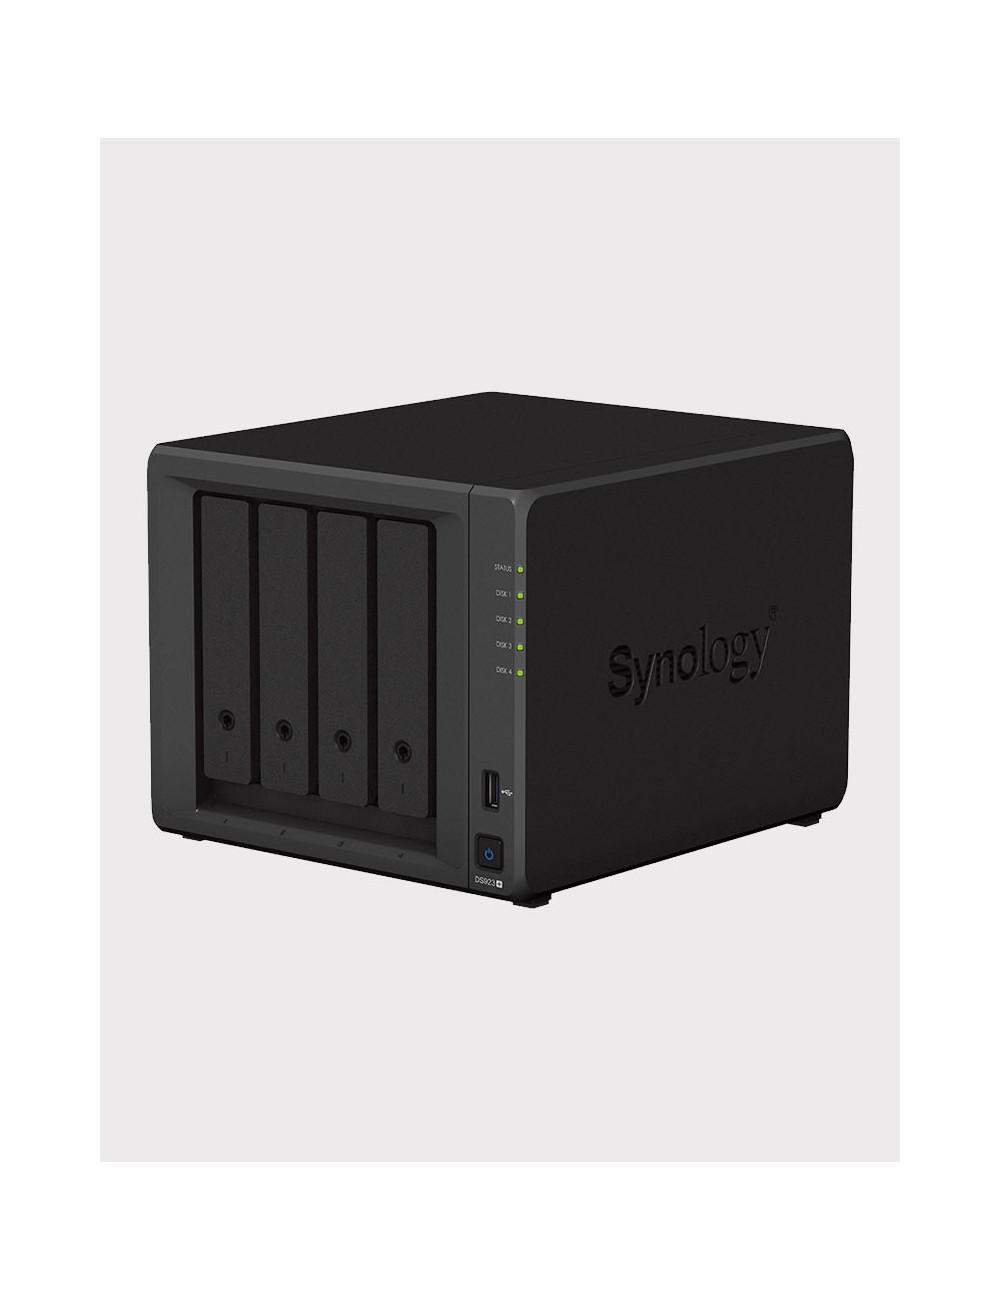 AP1x / AP2x / AP4x Remote Implementation Service